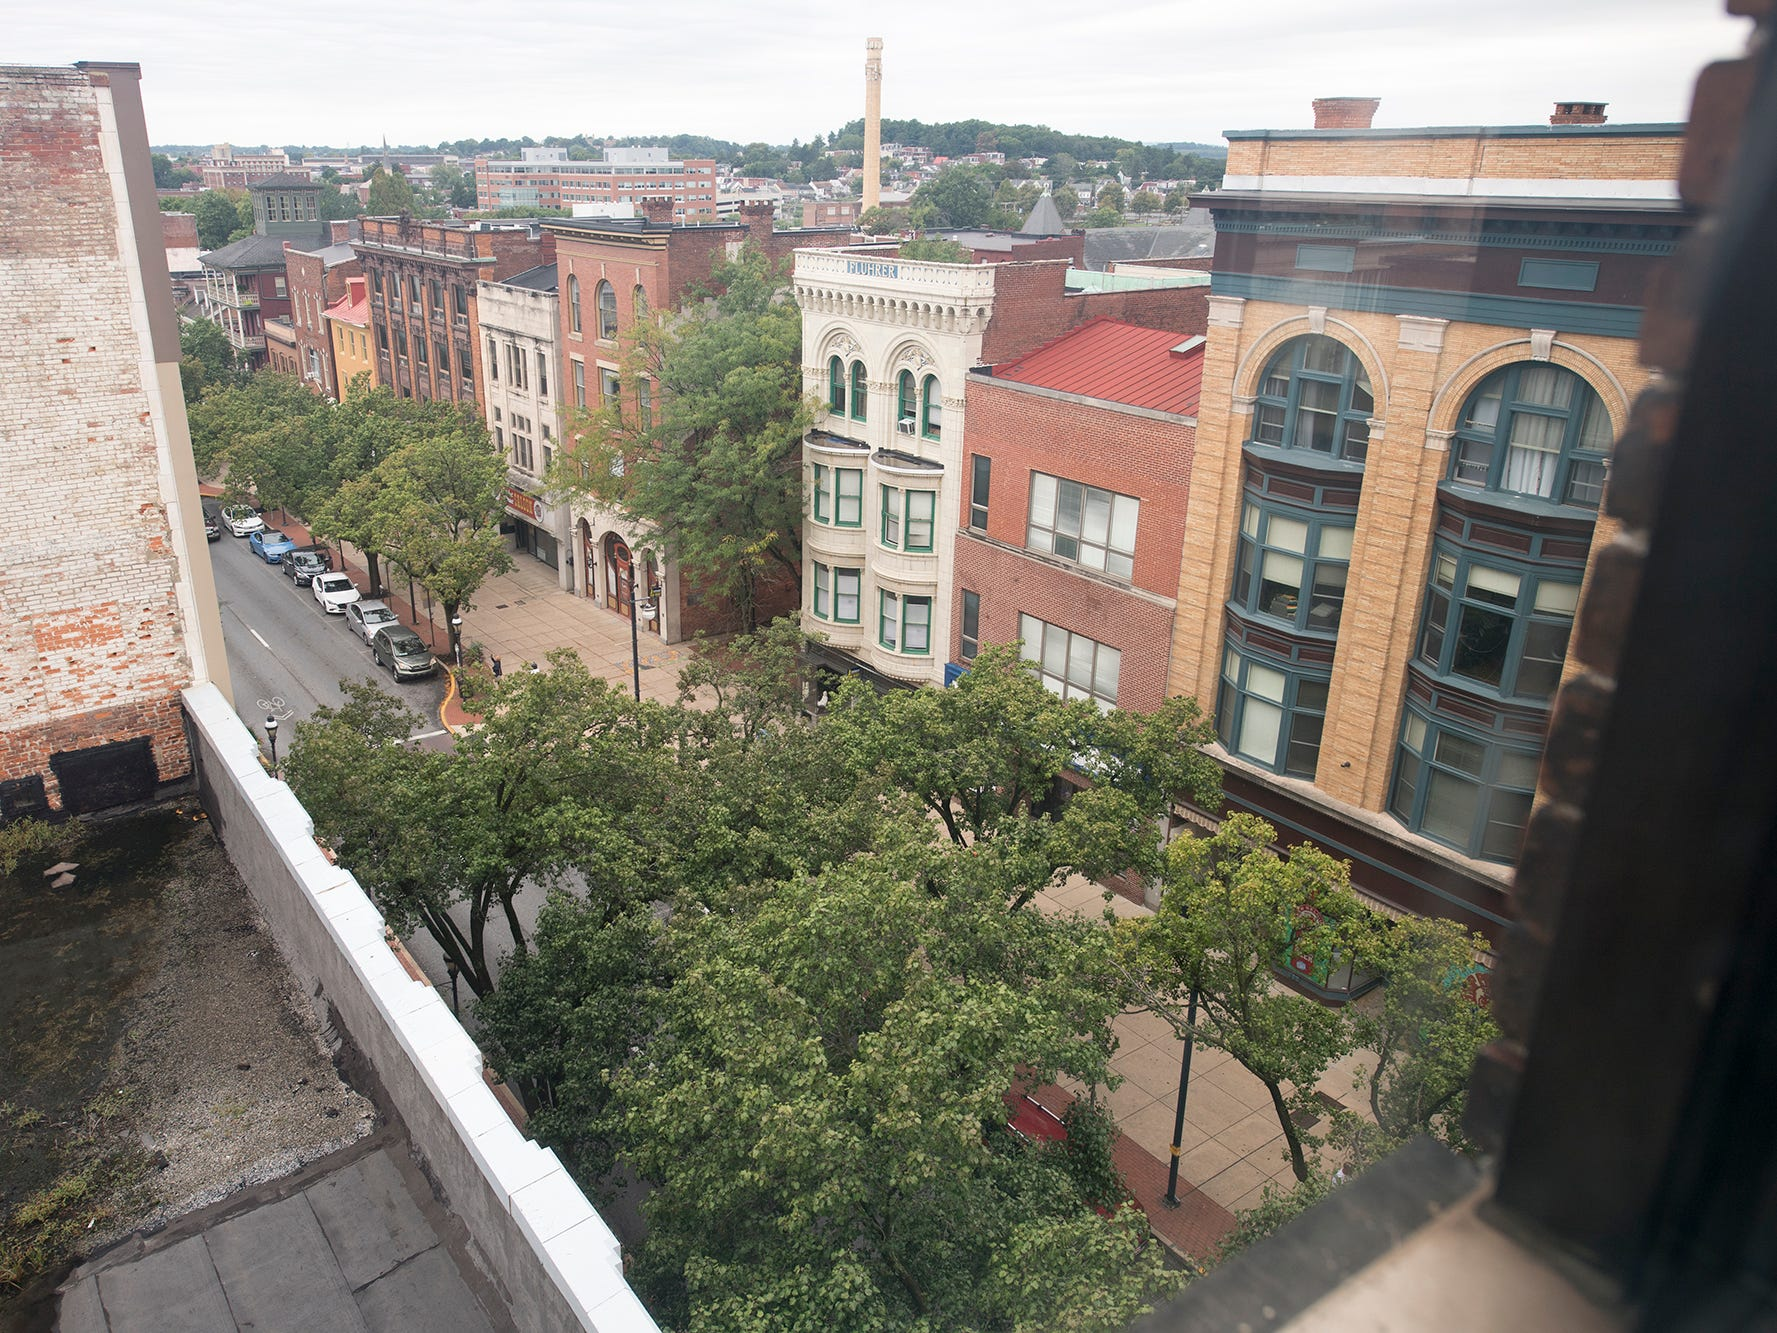 Looking west down West Market Street from window of the Rupp-Schmidt Building at 2 West Market Street in York.